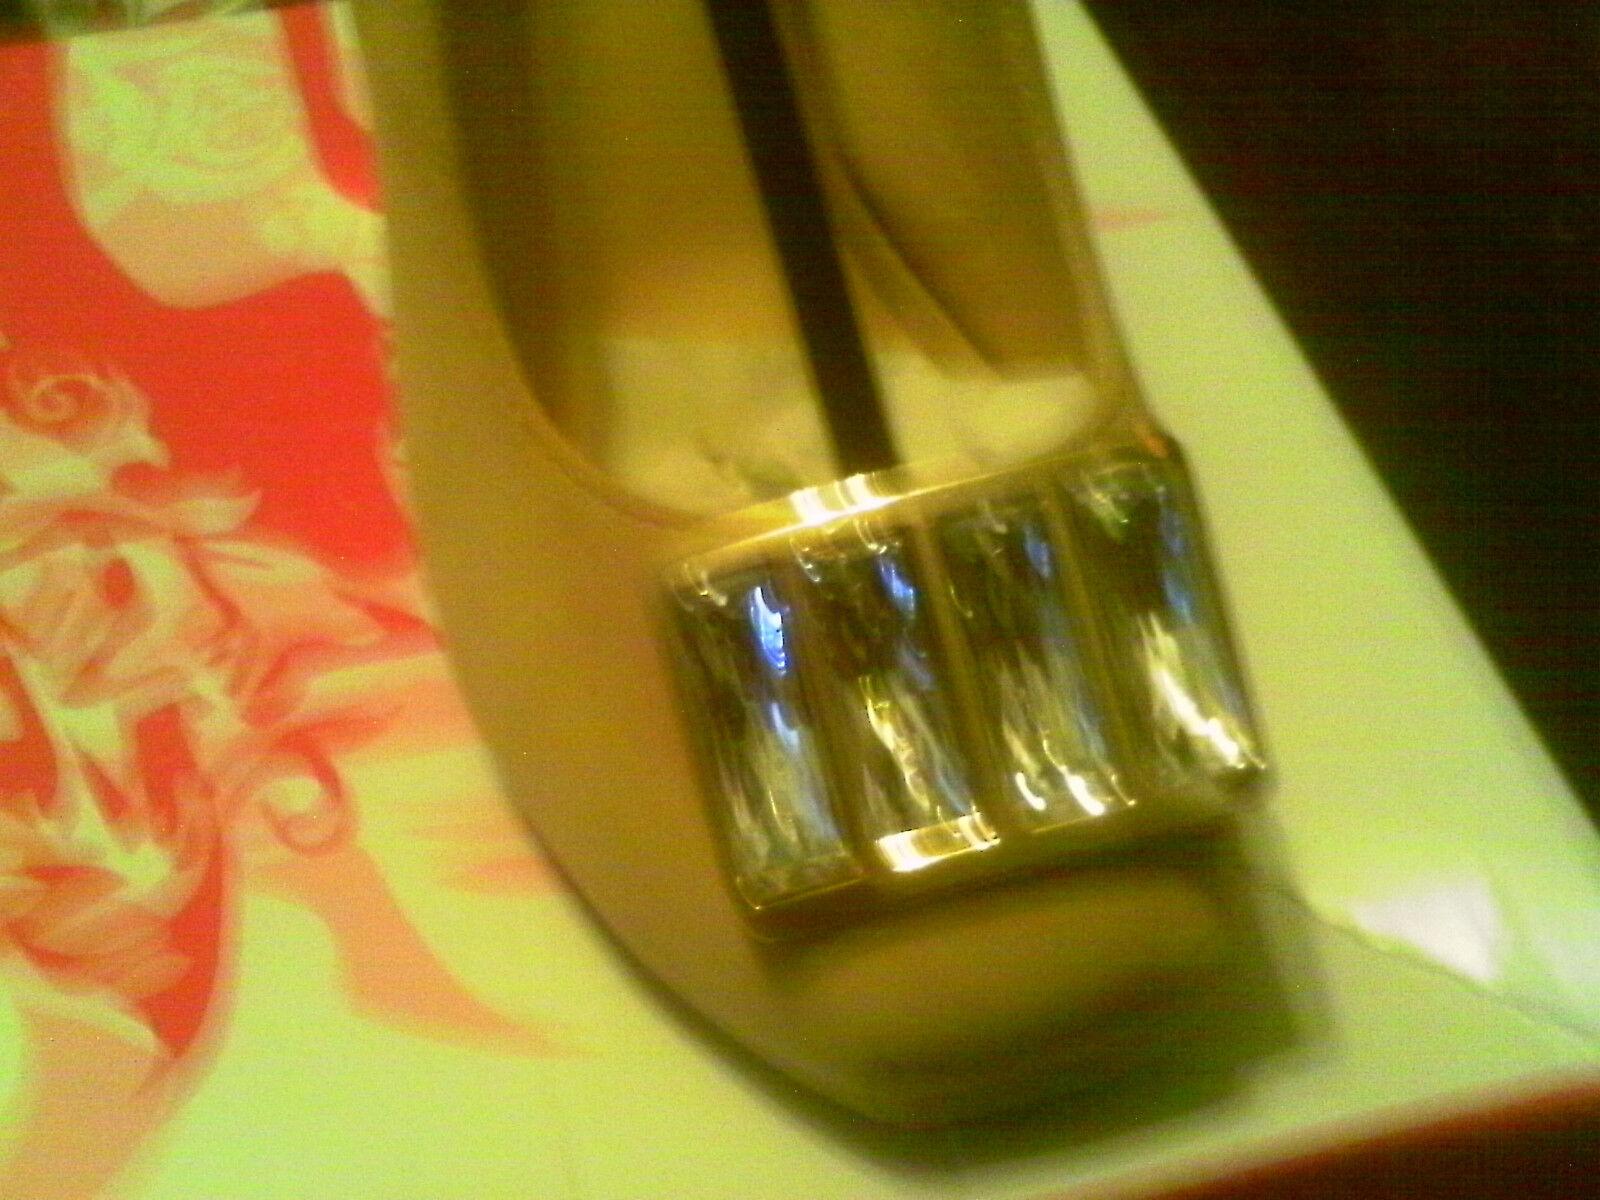 WILD Rosa BEIGE SUEDE LOOK Gold METALIC BLING PUMP PUMP BLING 9 M PLATFORM 78a097